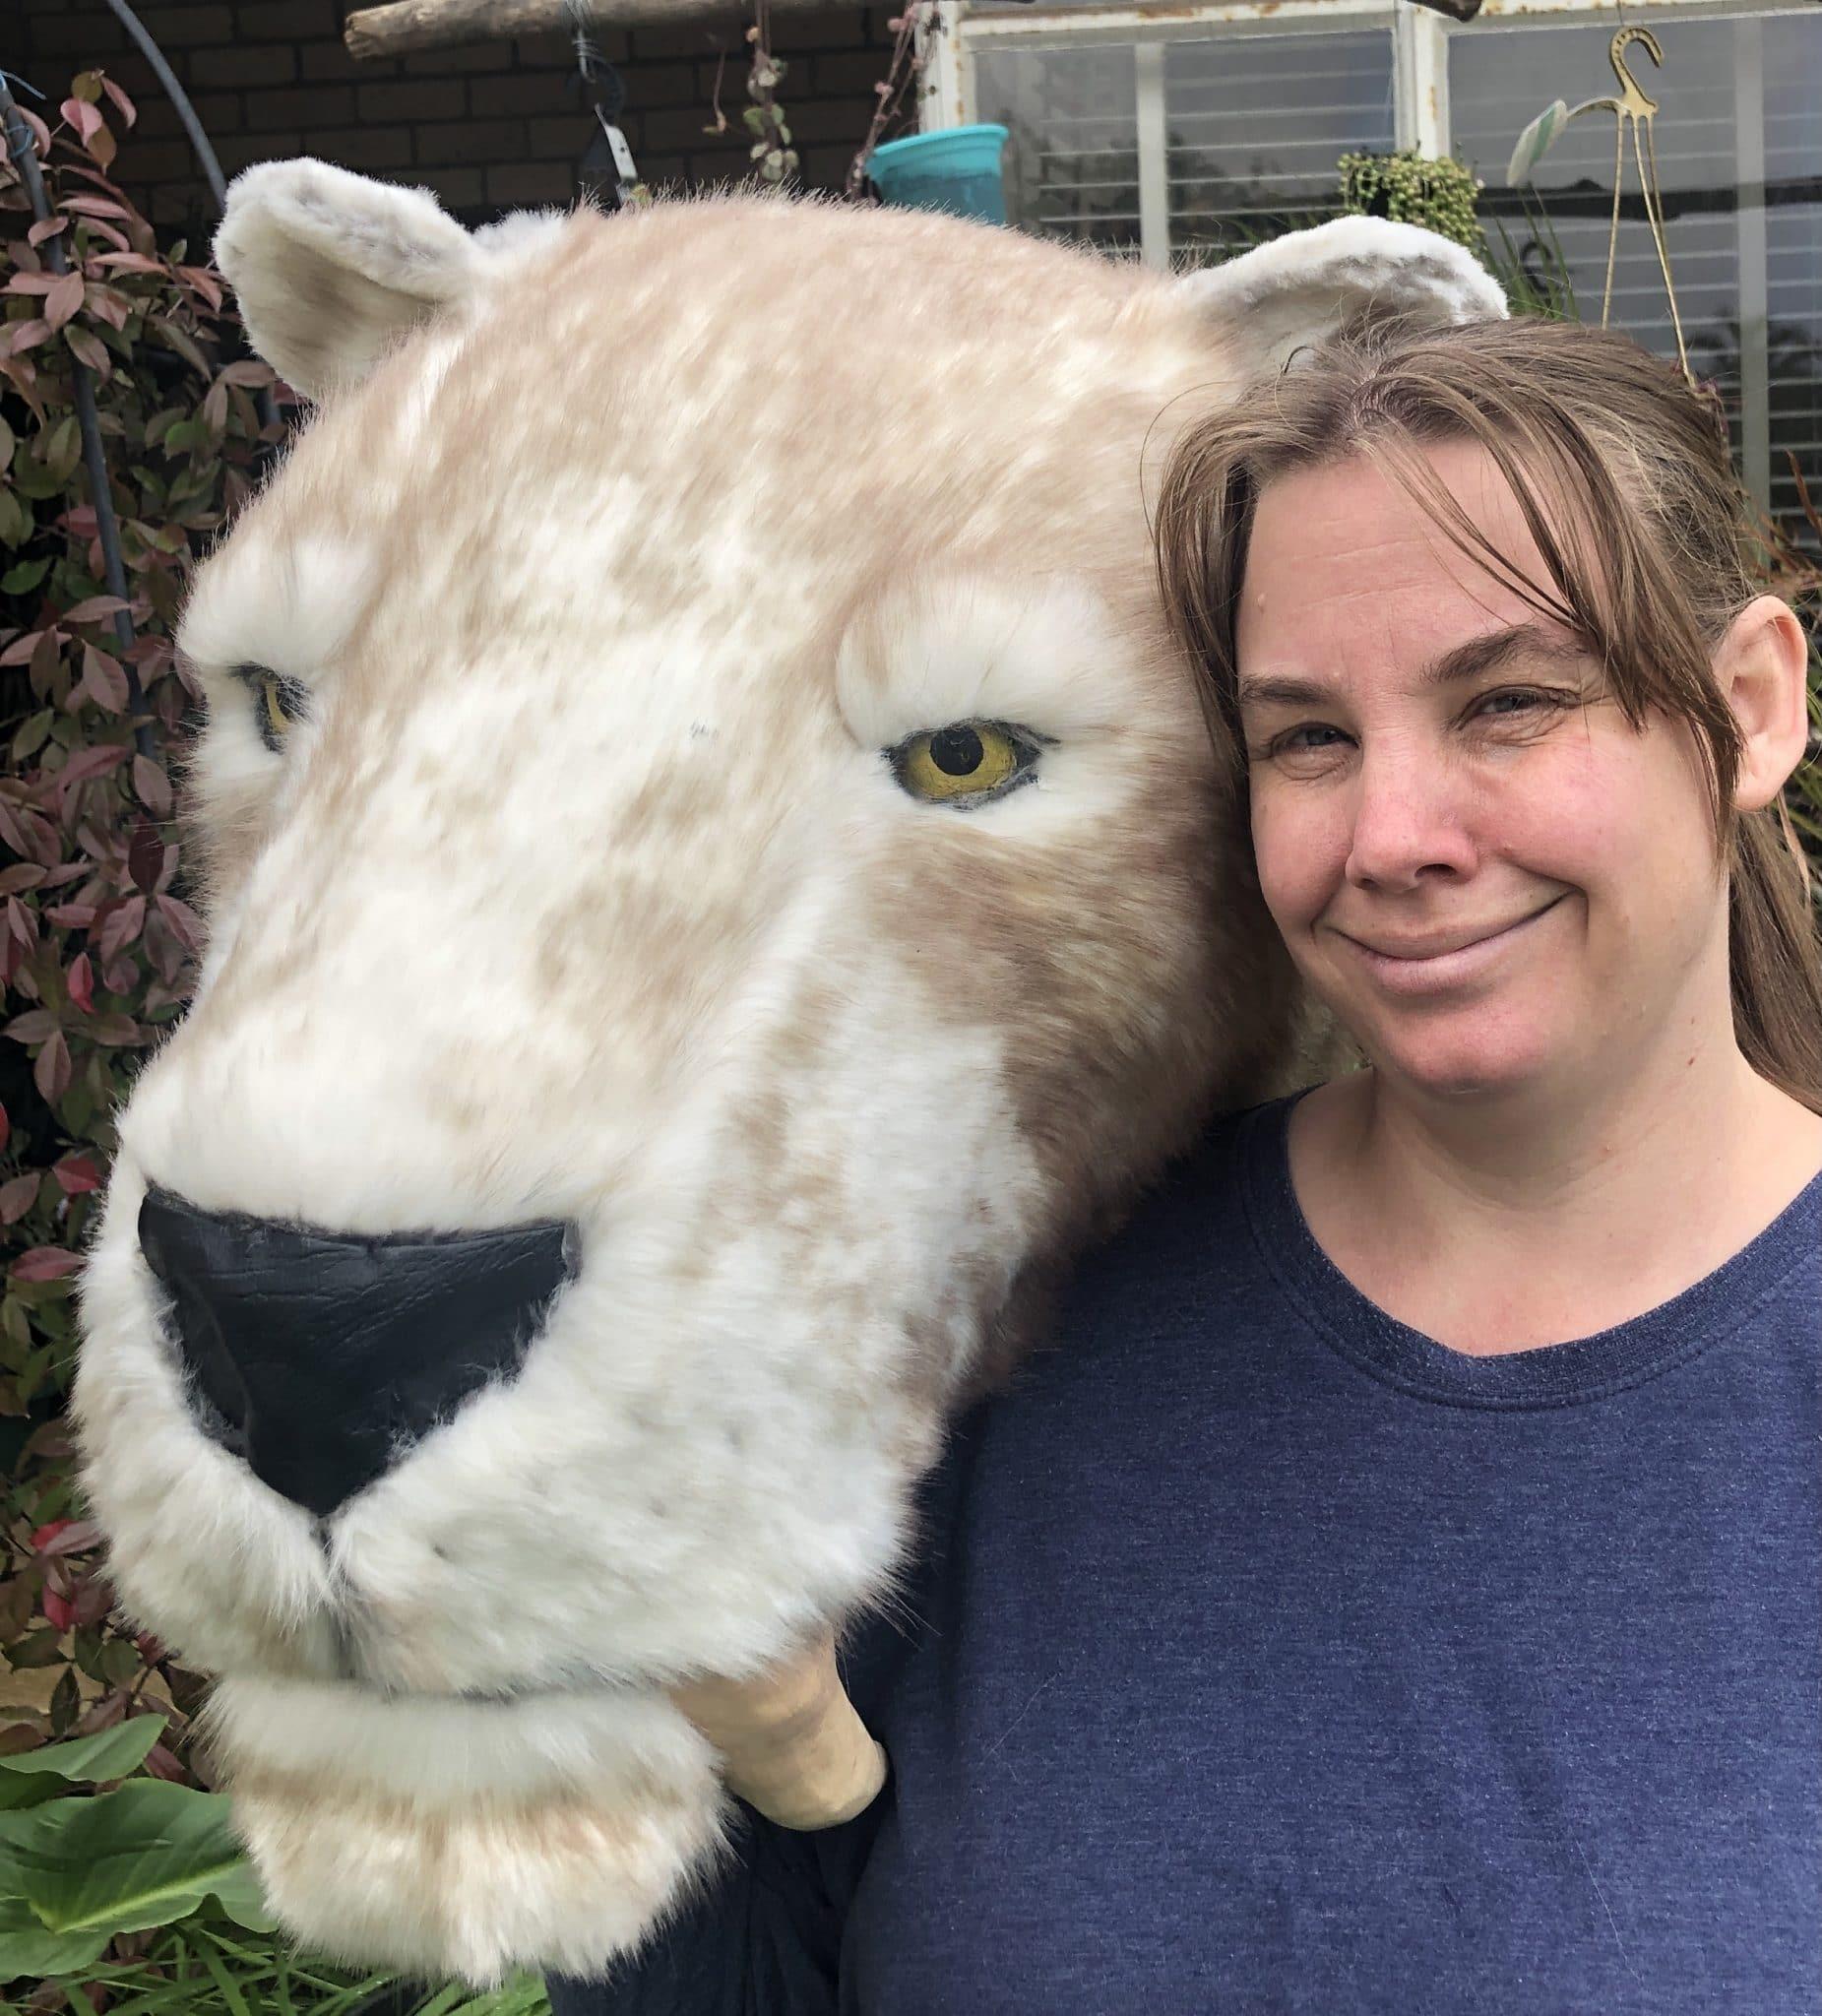 Sabertooth tiger head sculpture